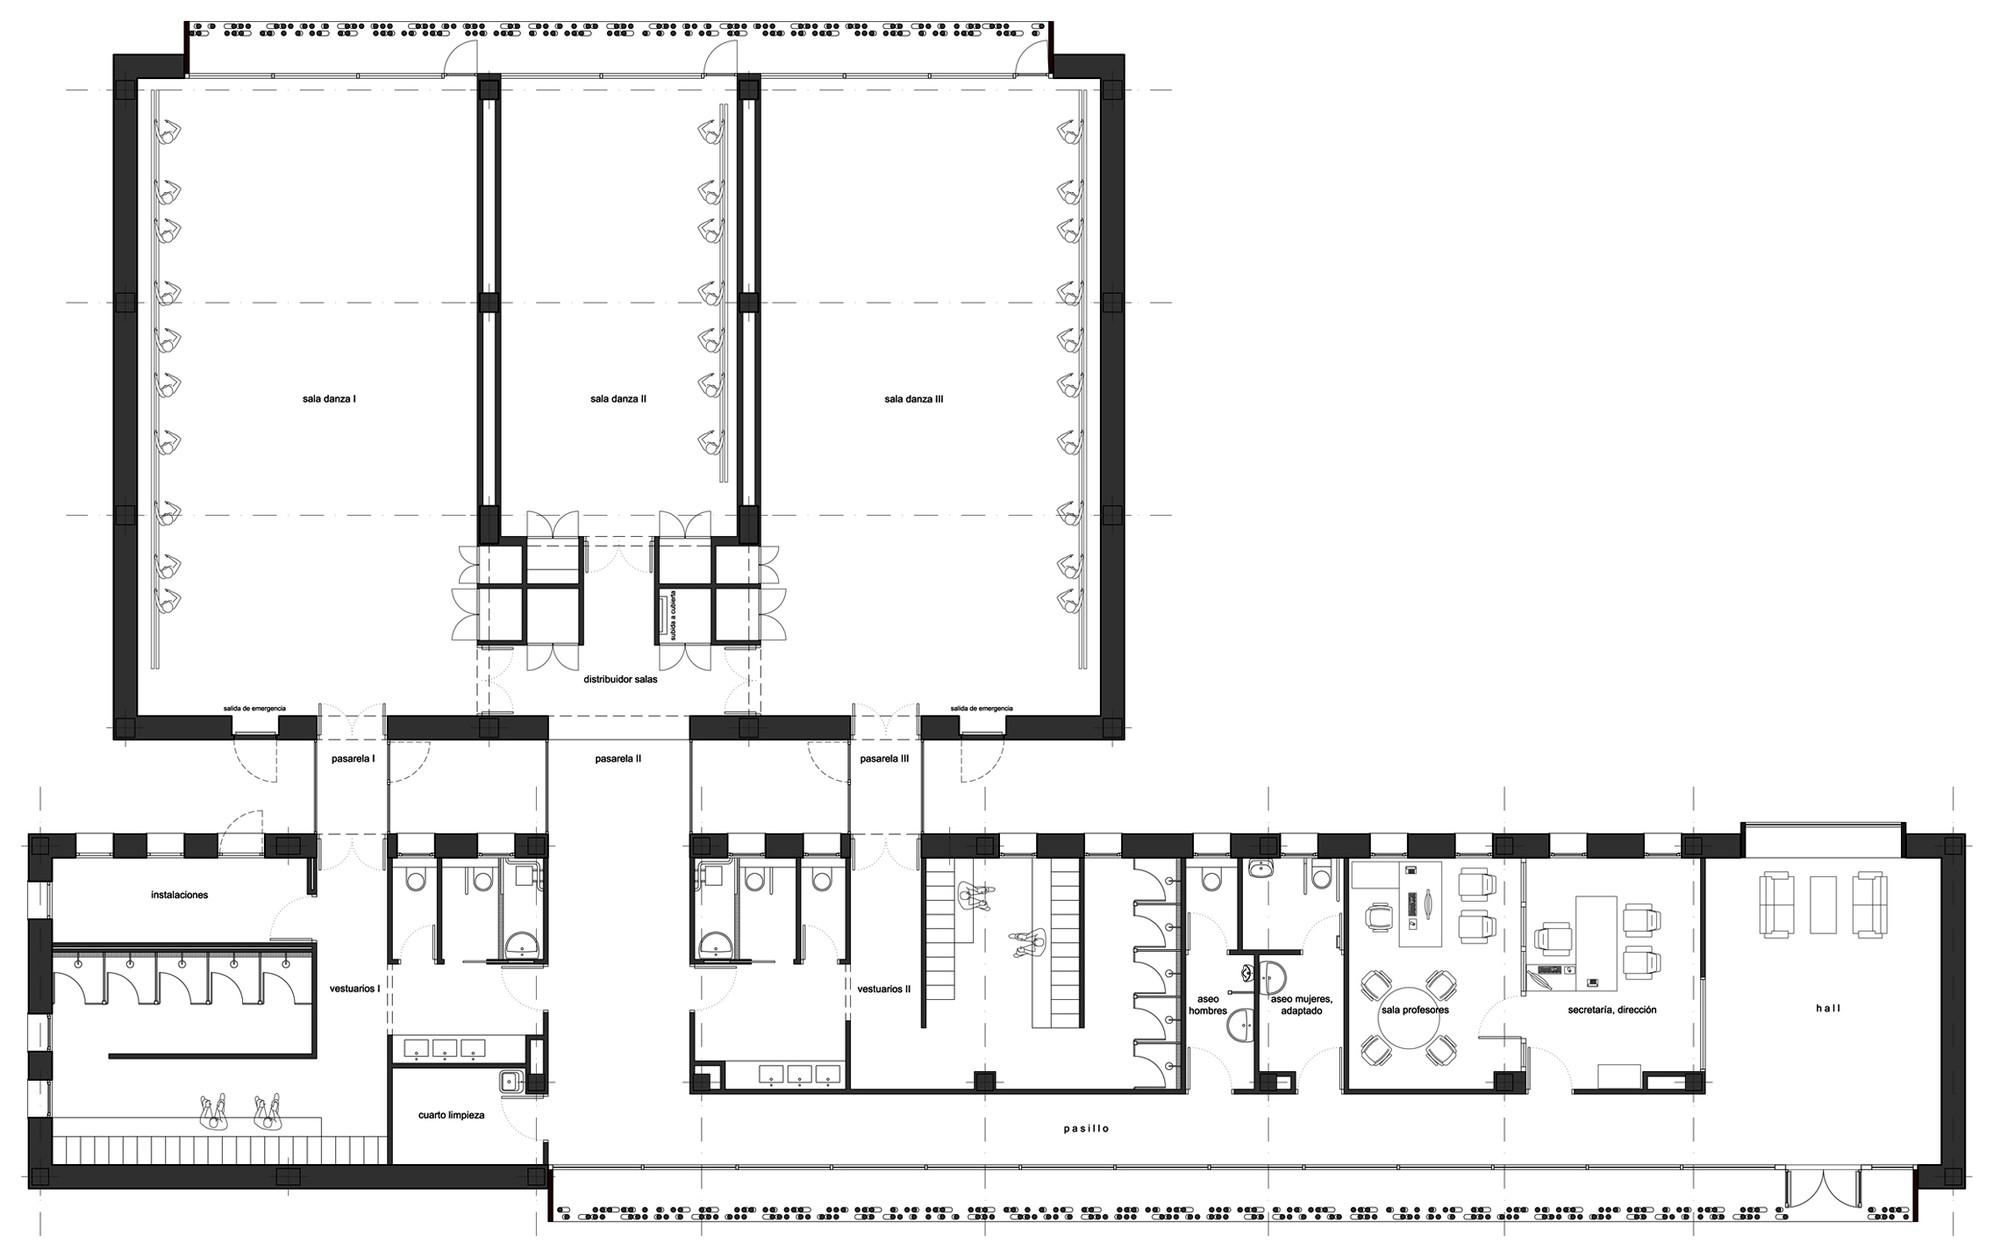 próximo projeto escola jean moulin prinvault architectes projeto  #666666 2000 1243